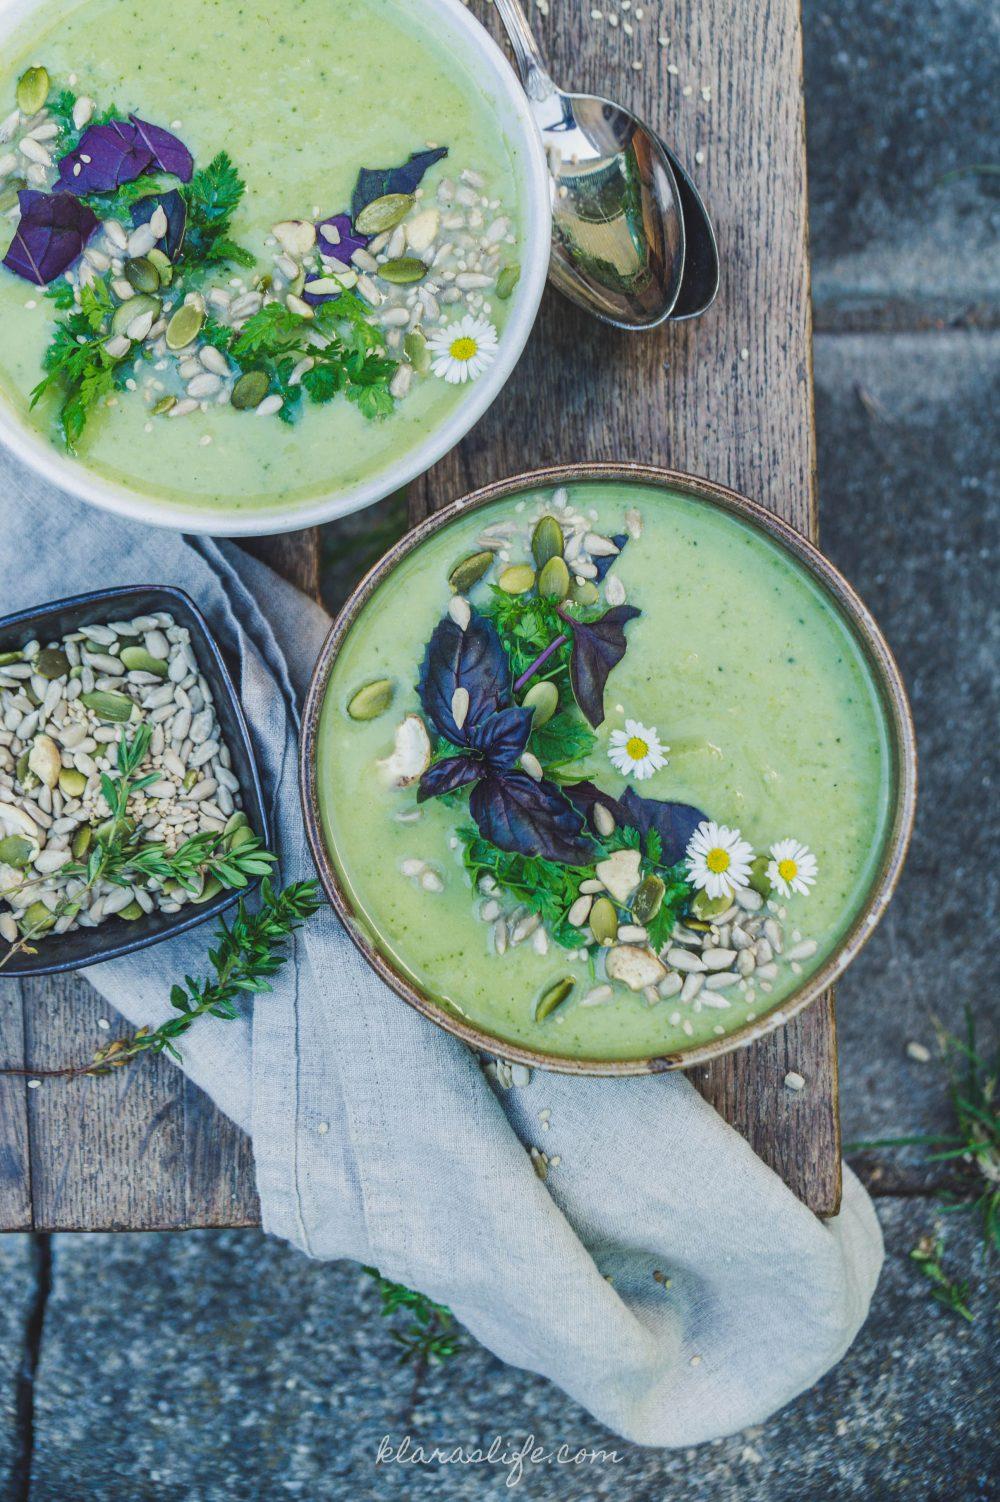 Broccoli & green pea soup